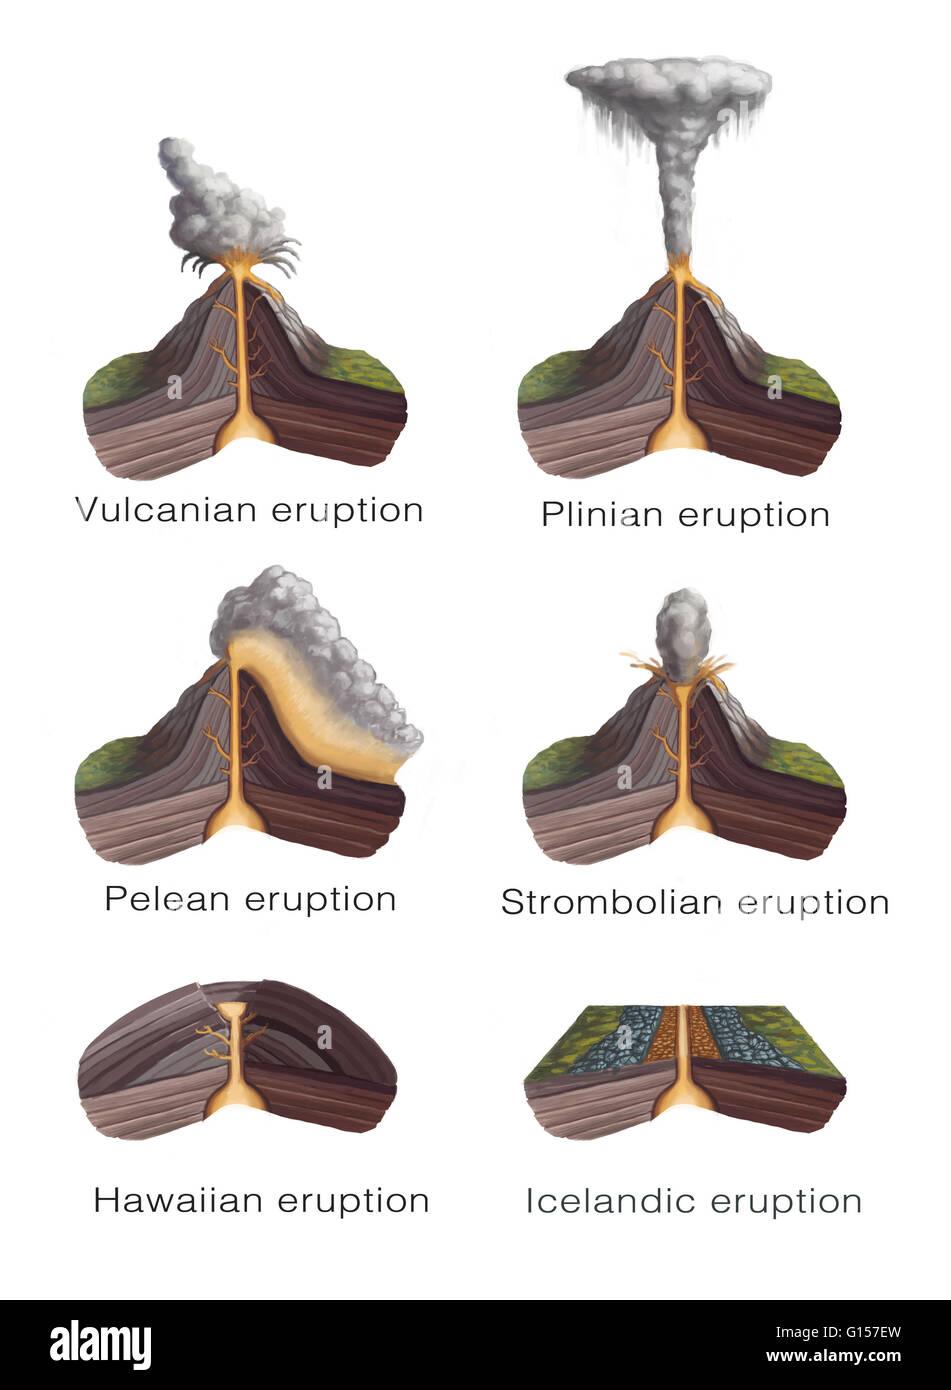 Tipos De Erupciones Volc U00e1nicas  Vulcanian Erupci U00f3n  Un